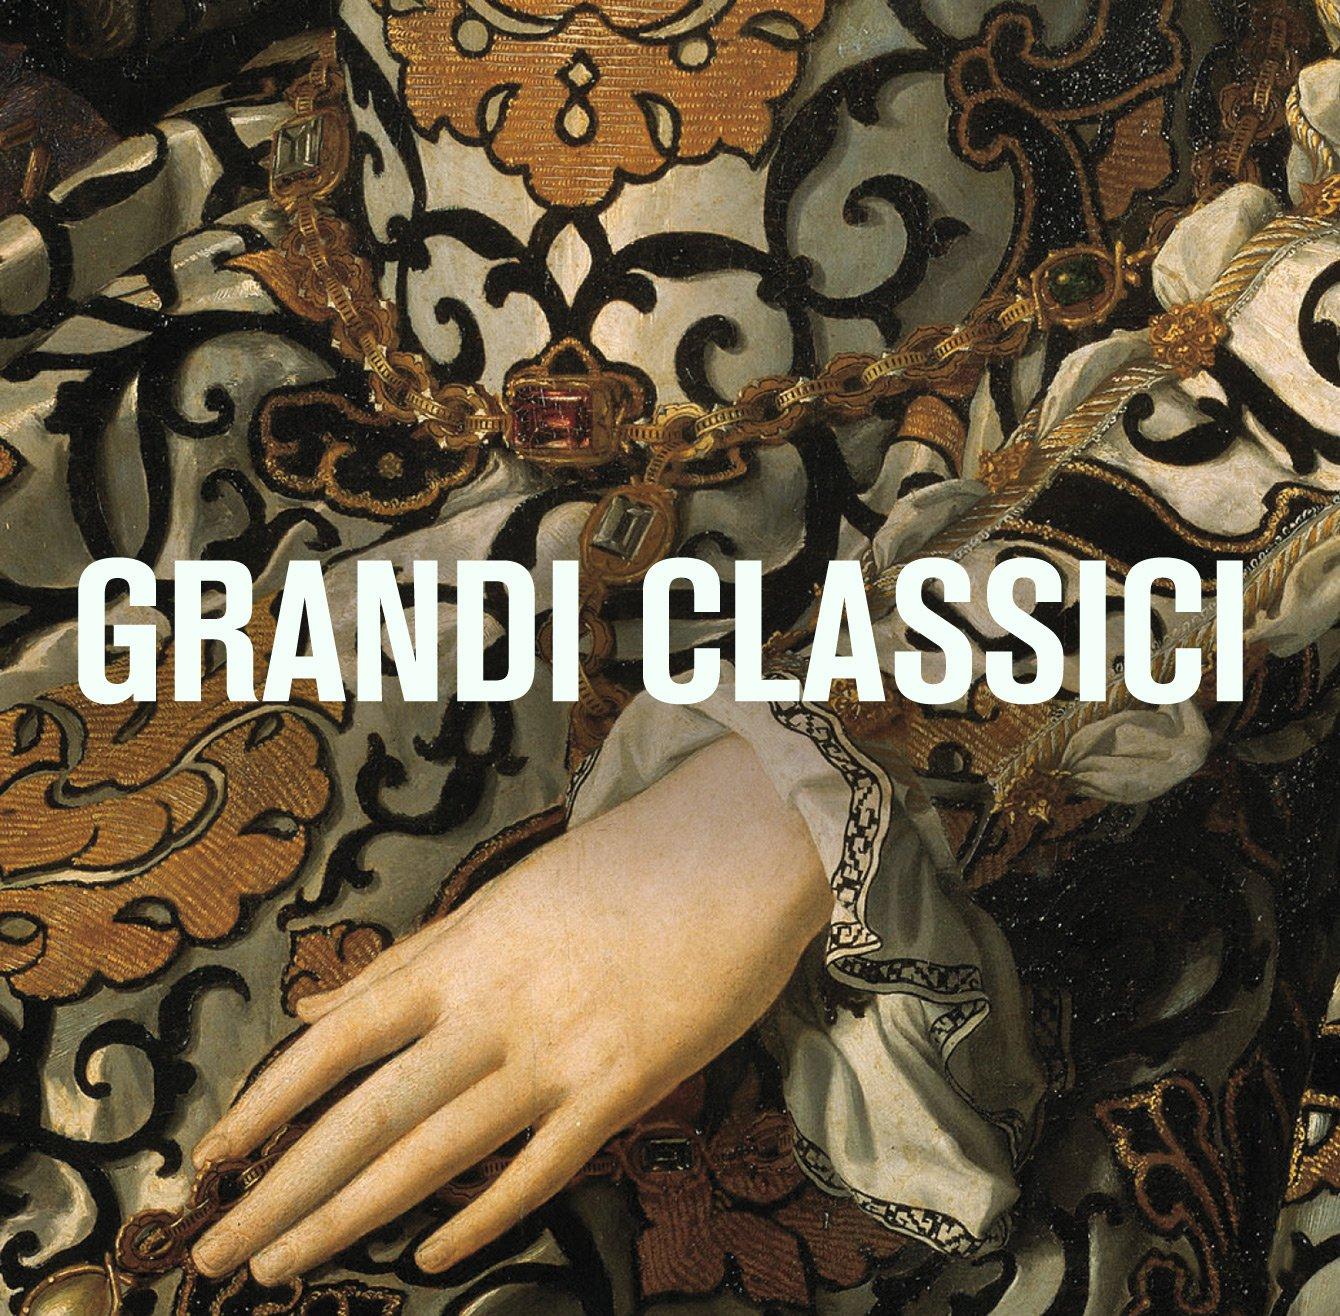 Grandi classici